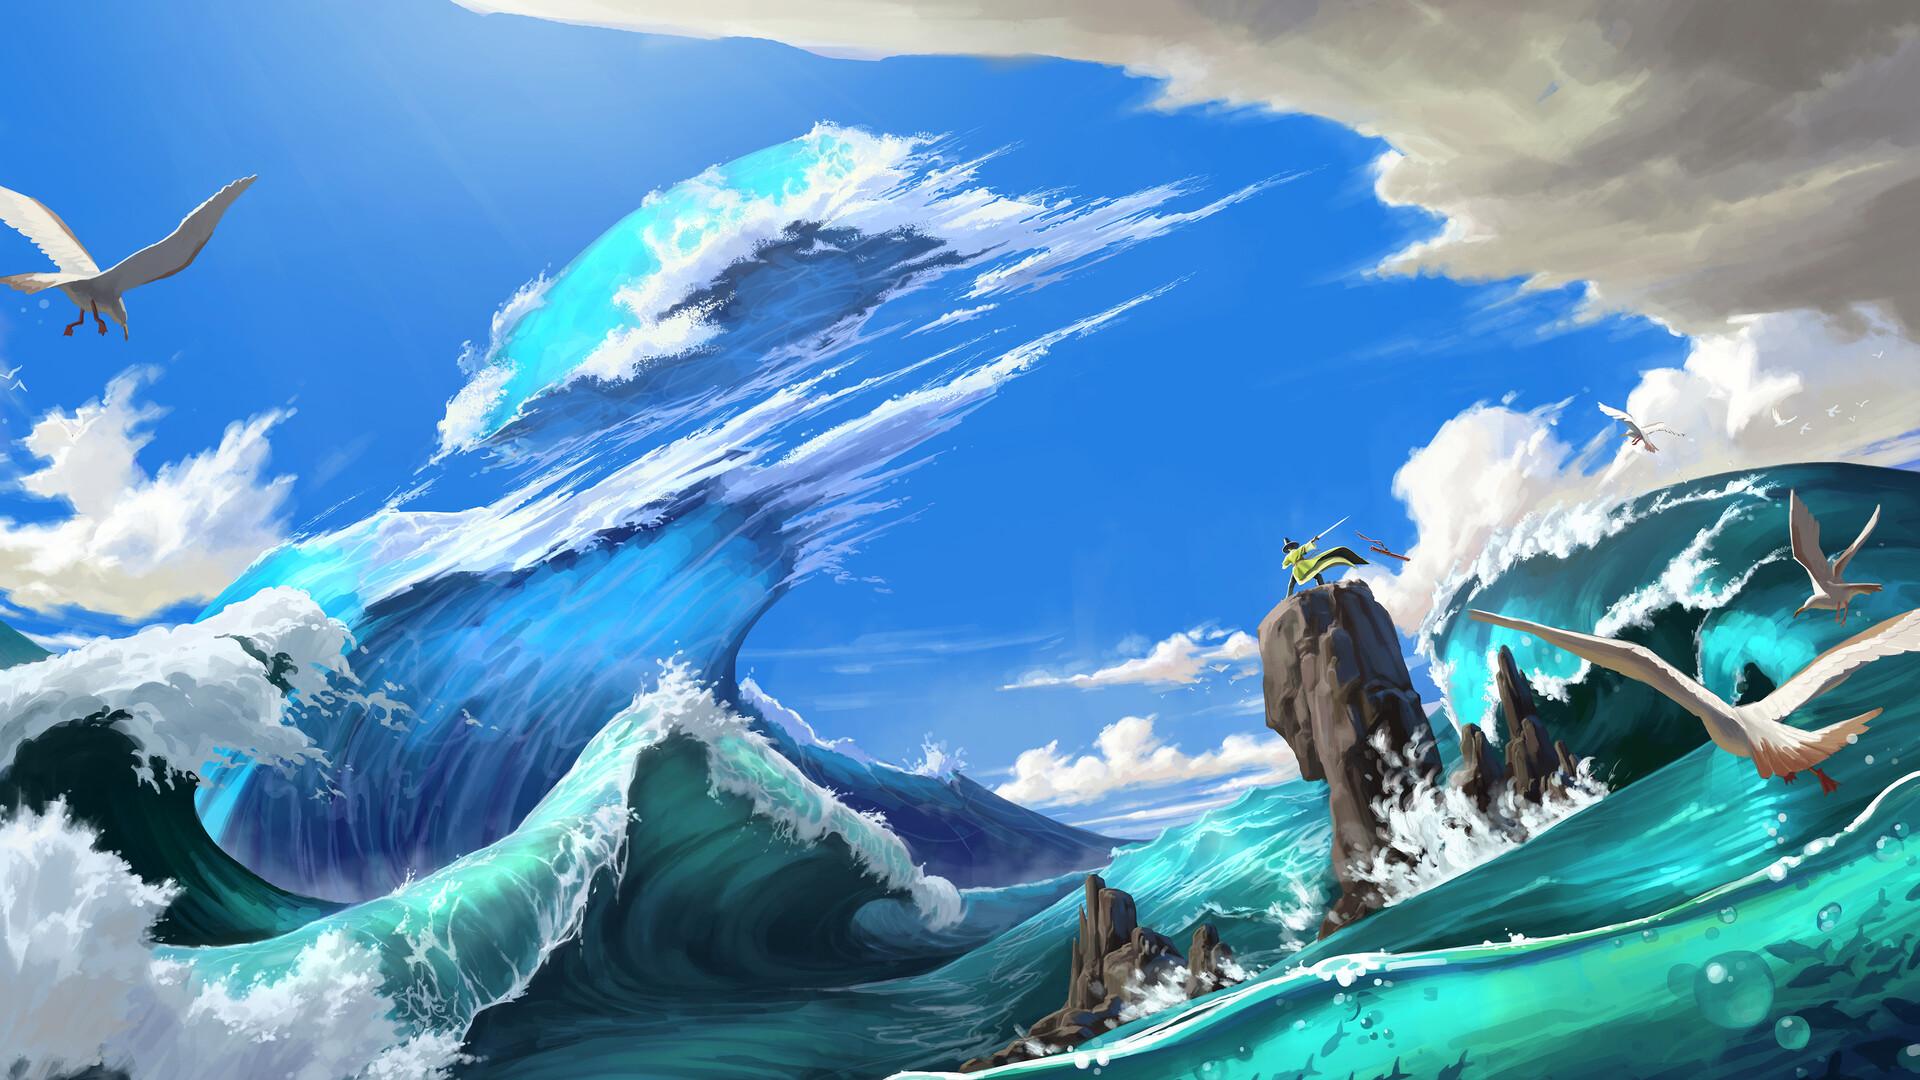 General 1920x1080 HUHSOO digital art fantasy art sword waves sea birds clouds seagulls adventurers